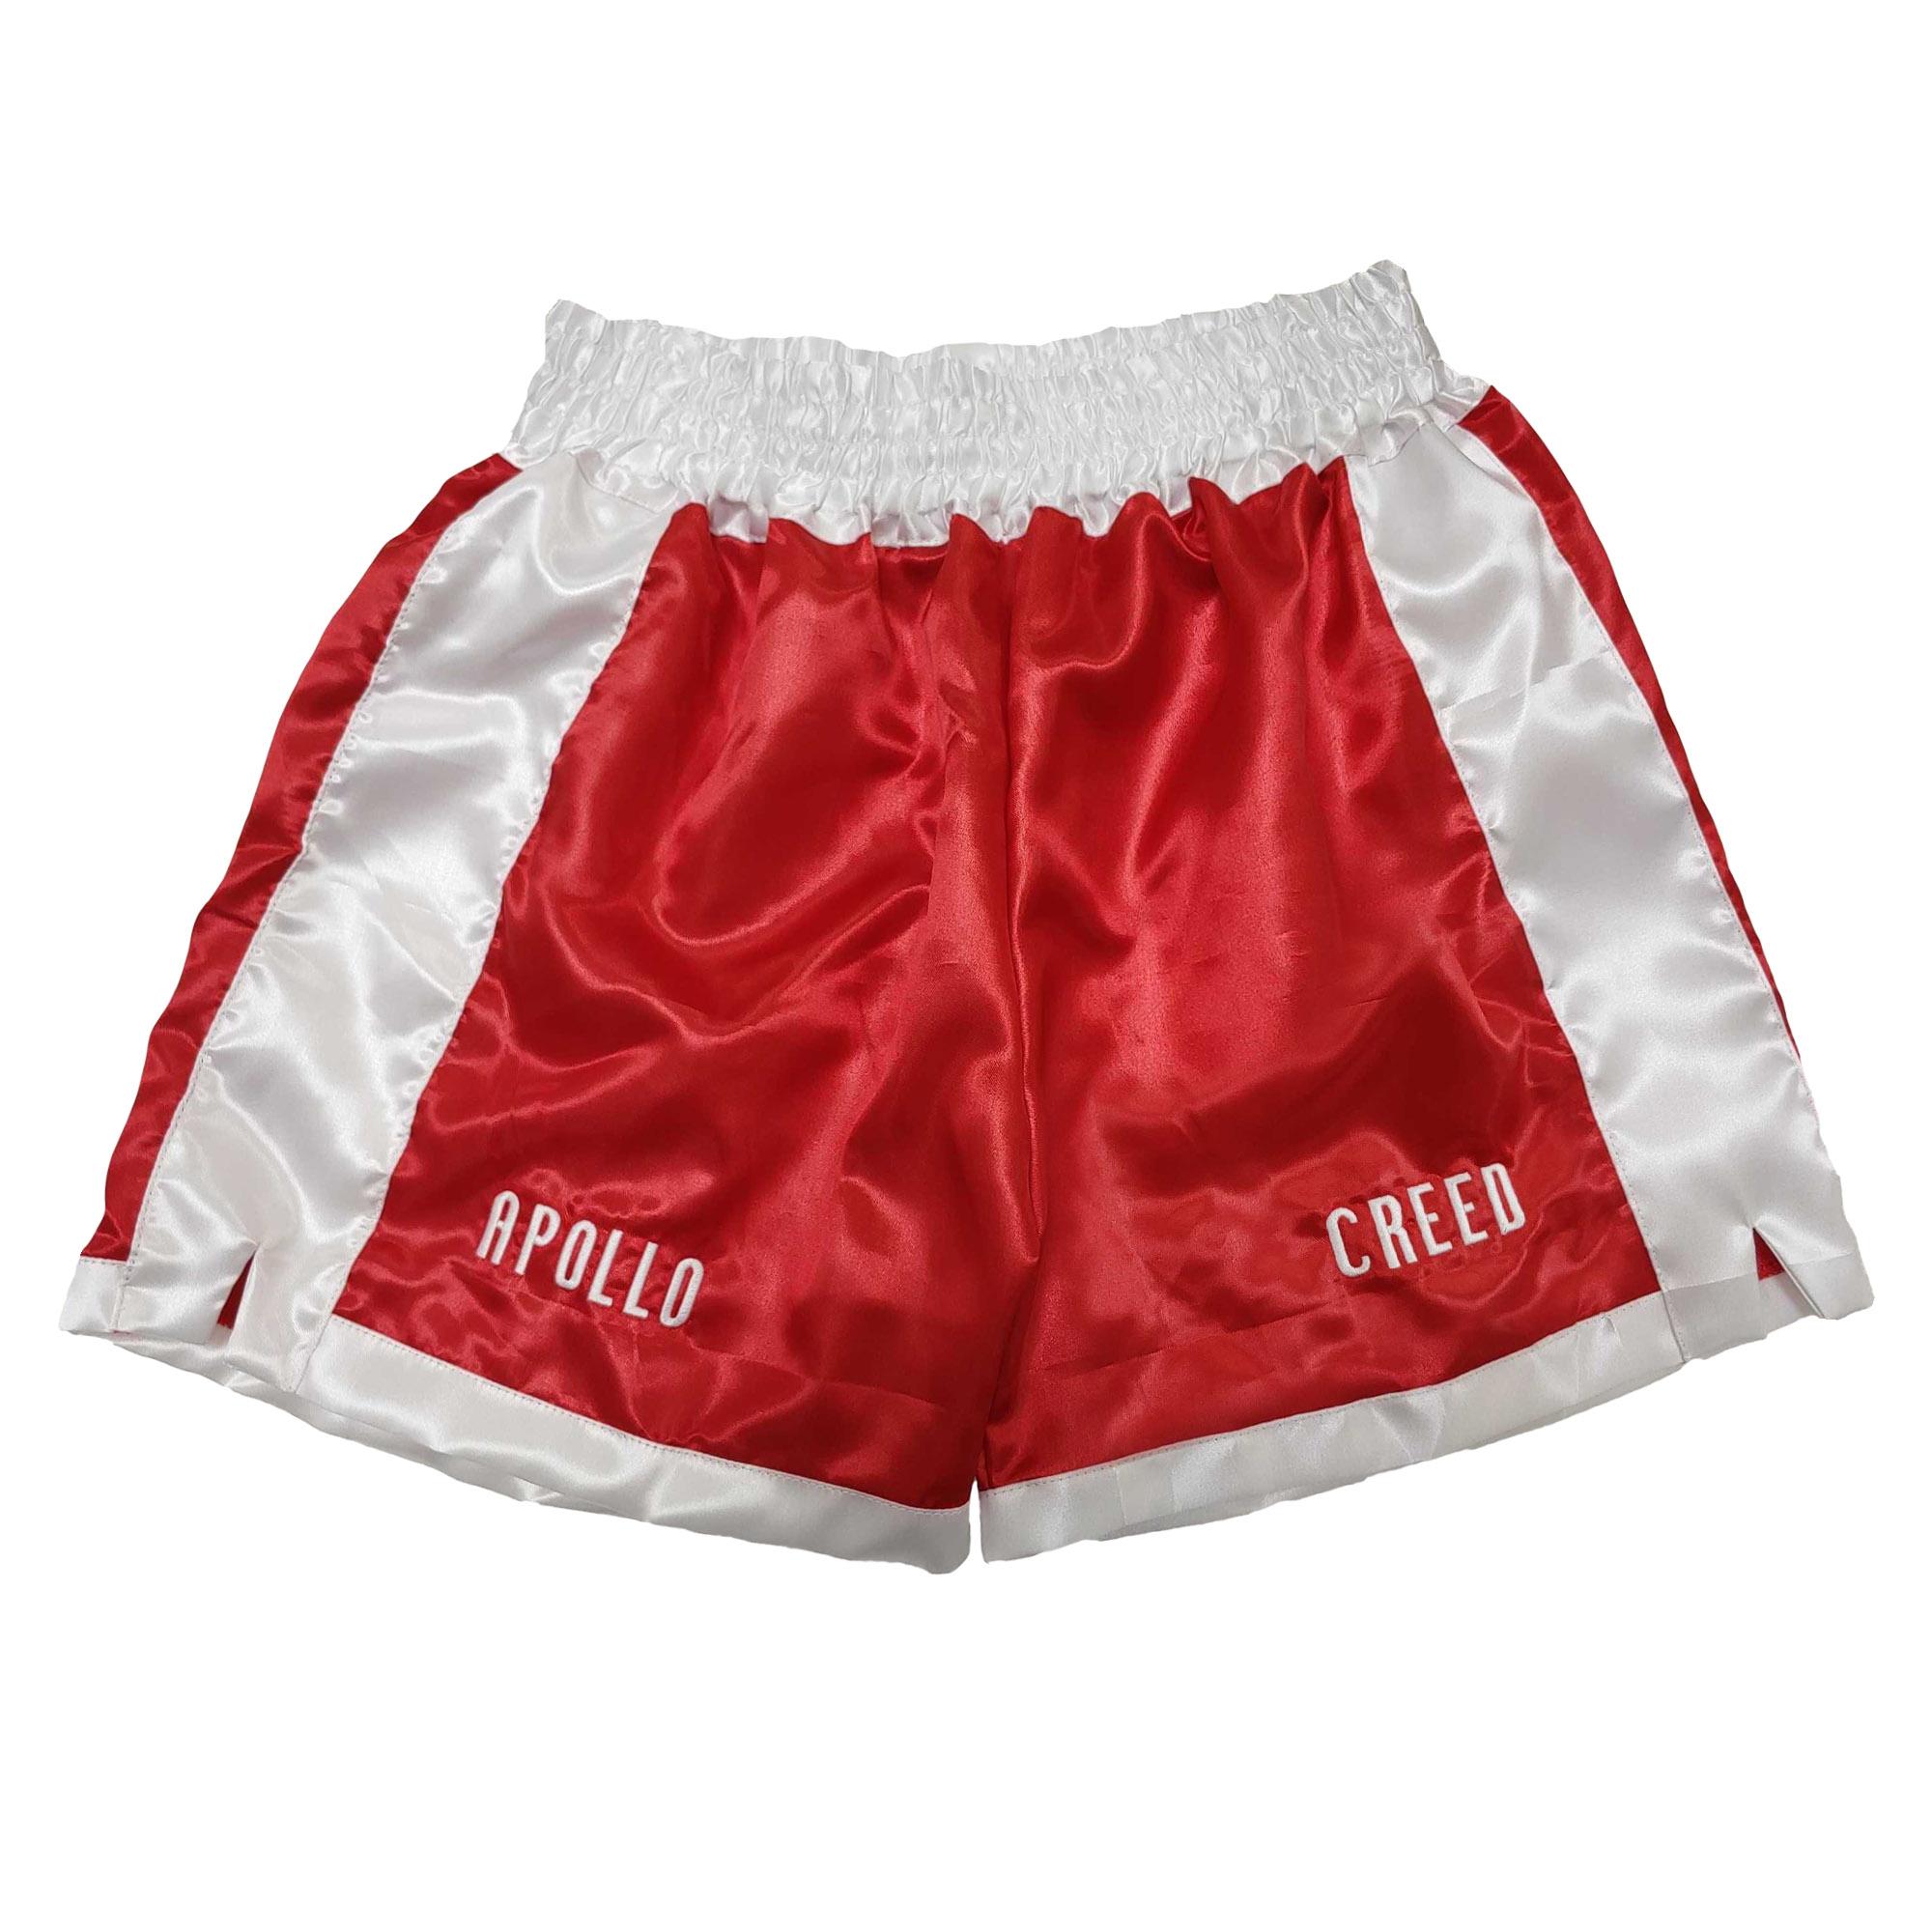 Apollo Creed Rocky II Boxing Trunks